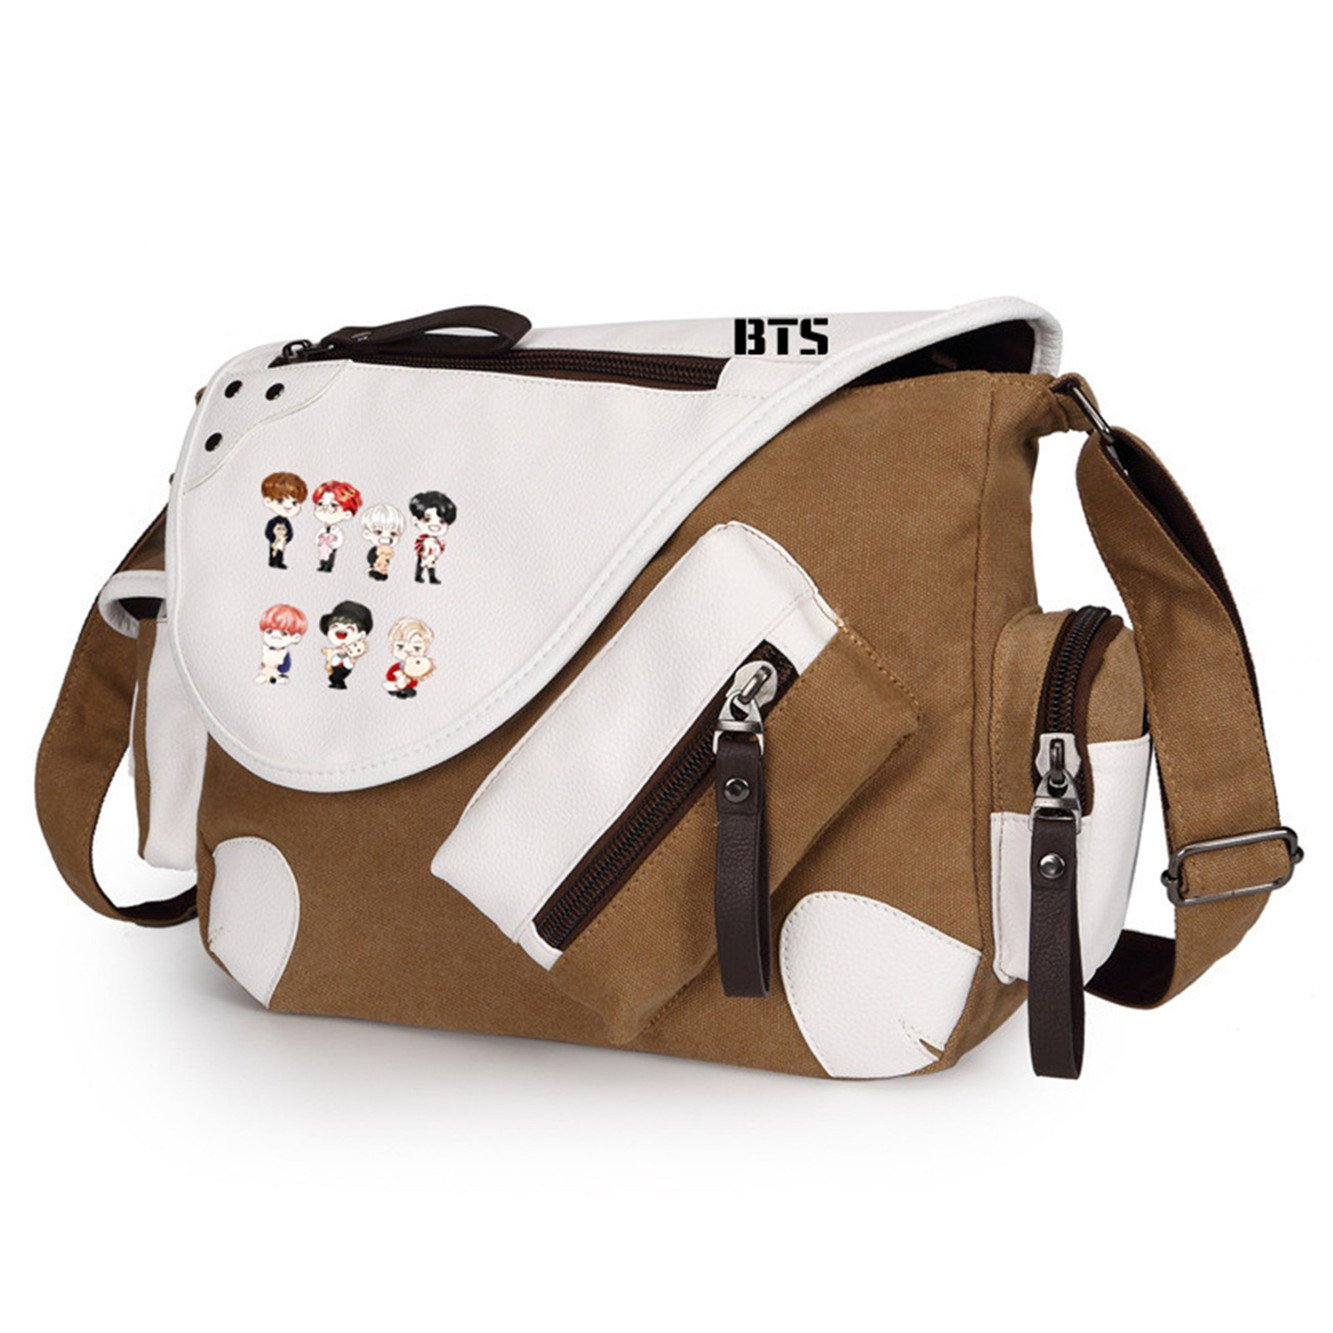 Black 1 JUSTGOGO BTS Bangtan boys Messenger Bag Cross-body Bag Shoulder Bag Travel Bag Handbag Tote Bag